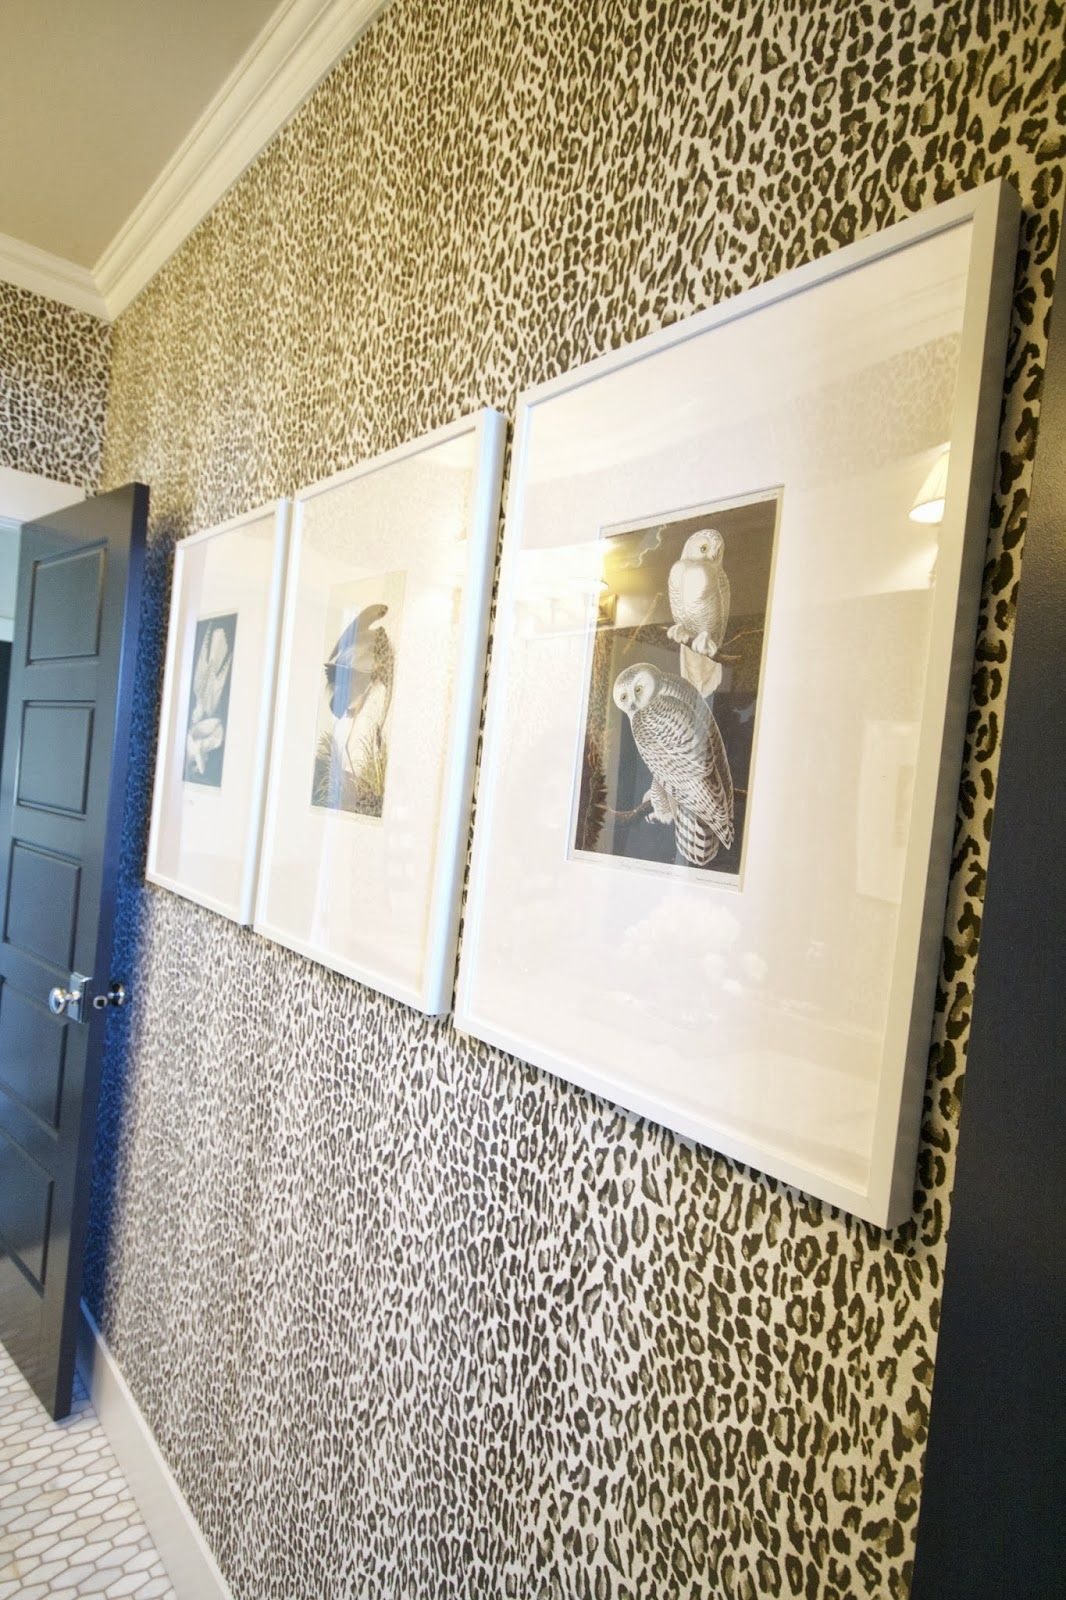 leopard wallpapered bathroom (one week makeover reveal